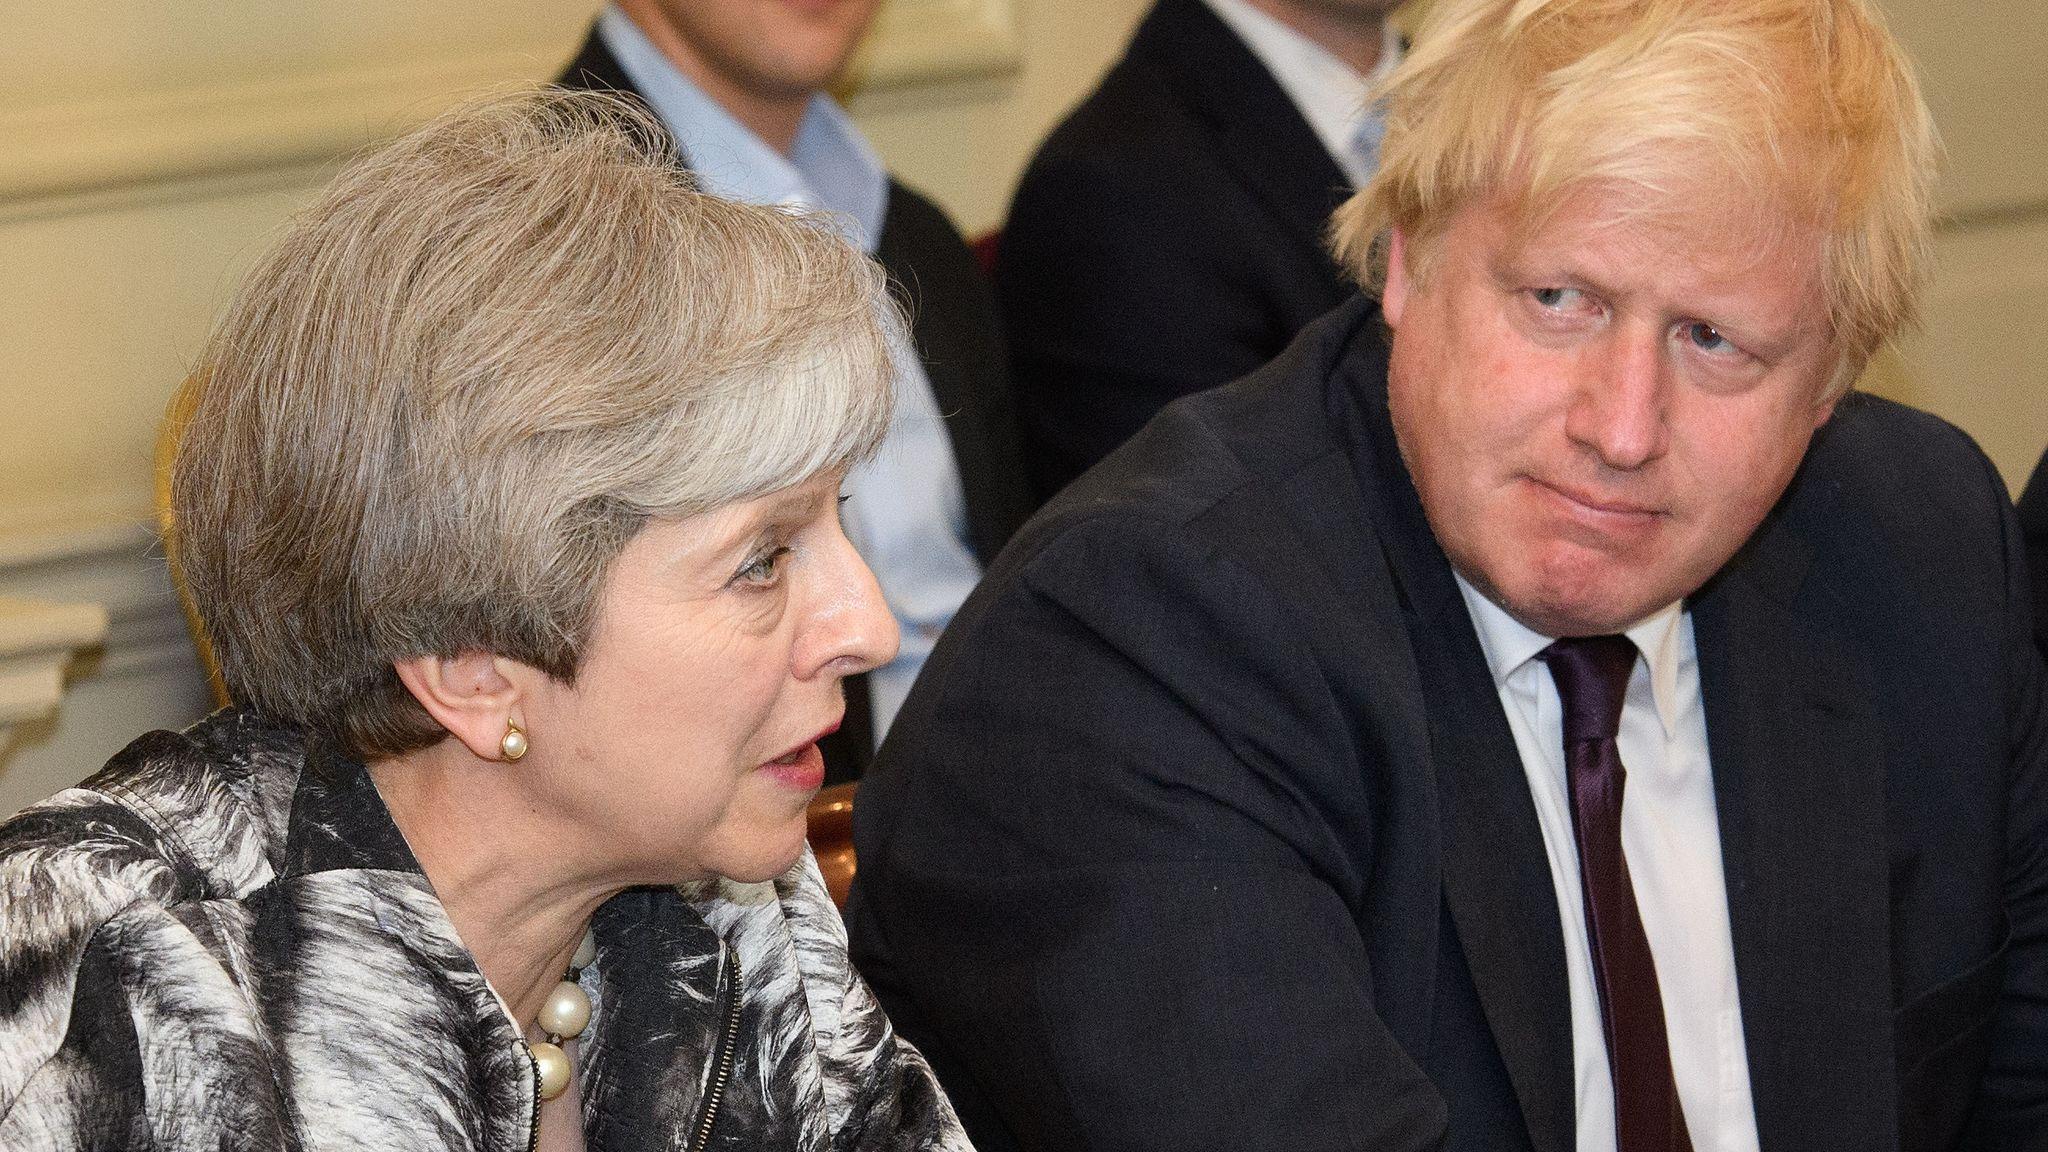 Downing Street insists there will be no hard Irish border